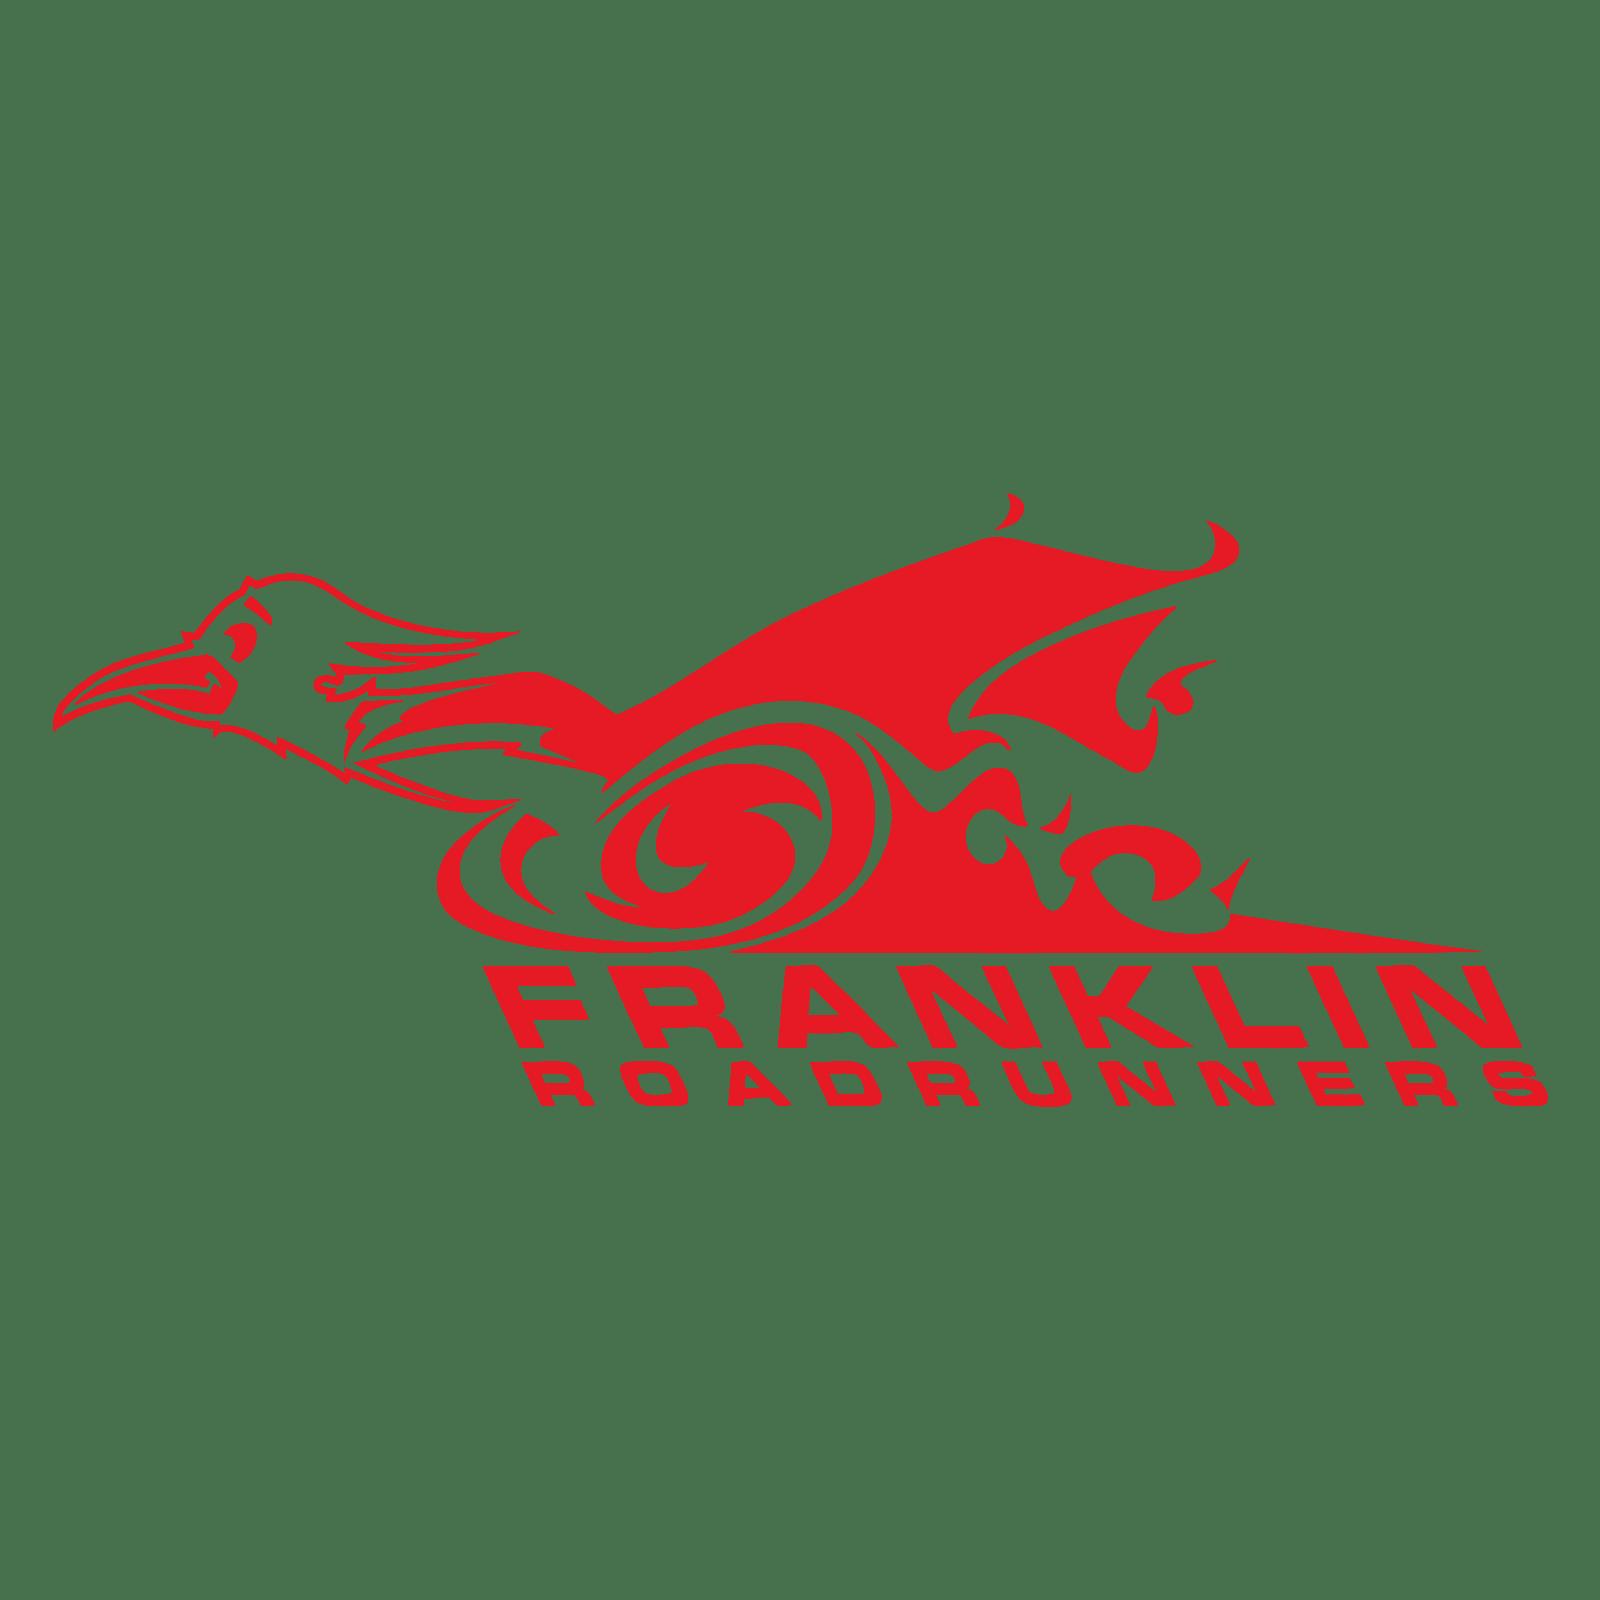 franklin roadrunners, dunns sporting goods, team spiritwear